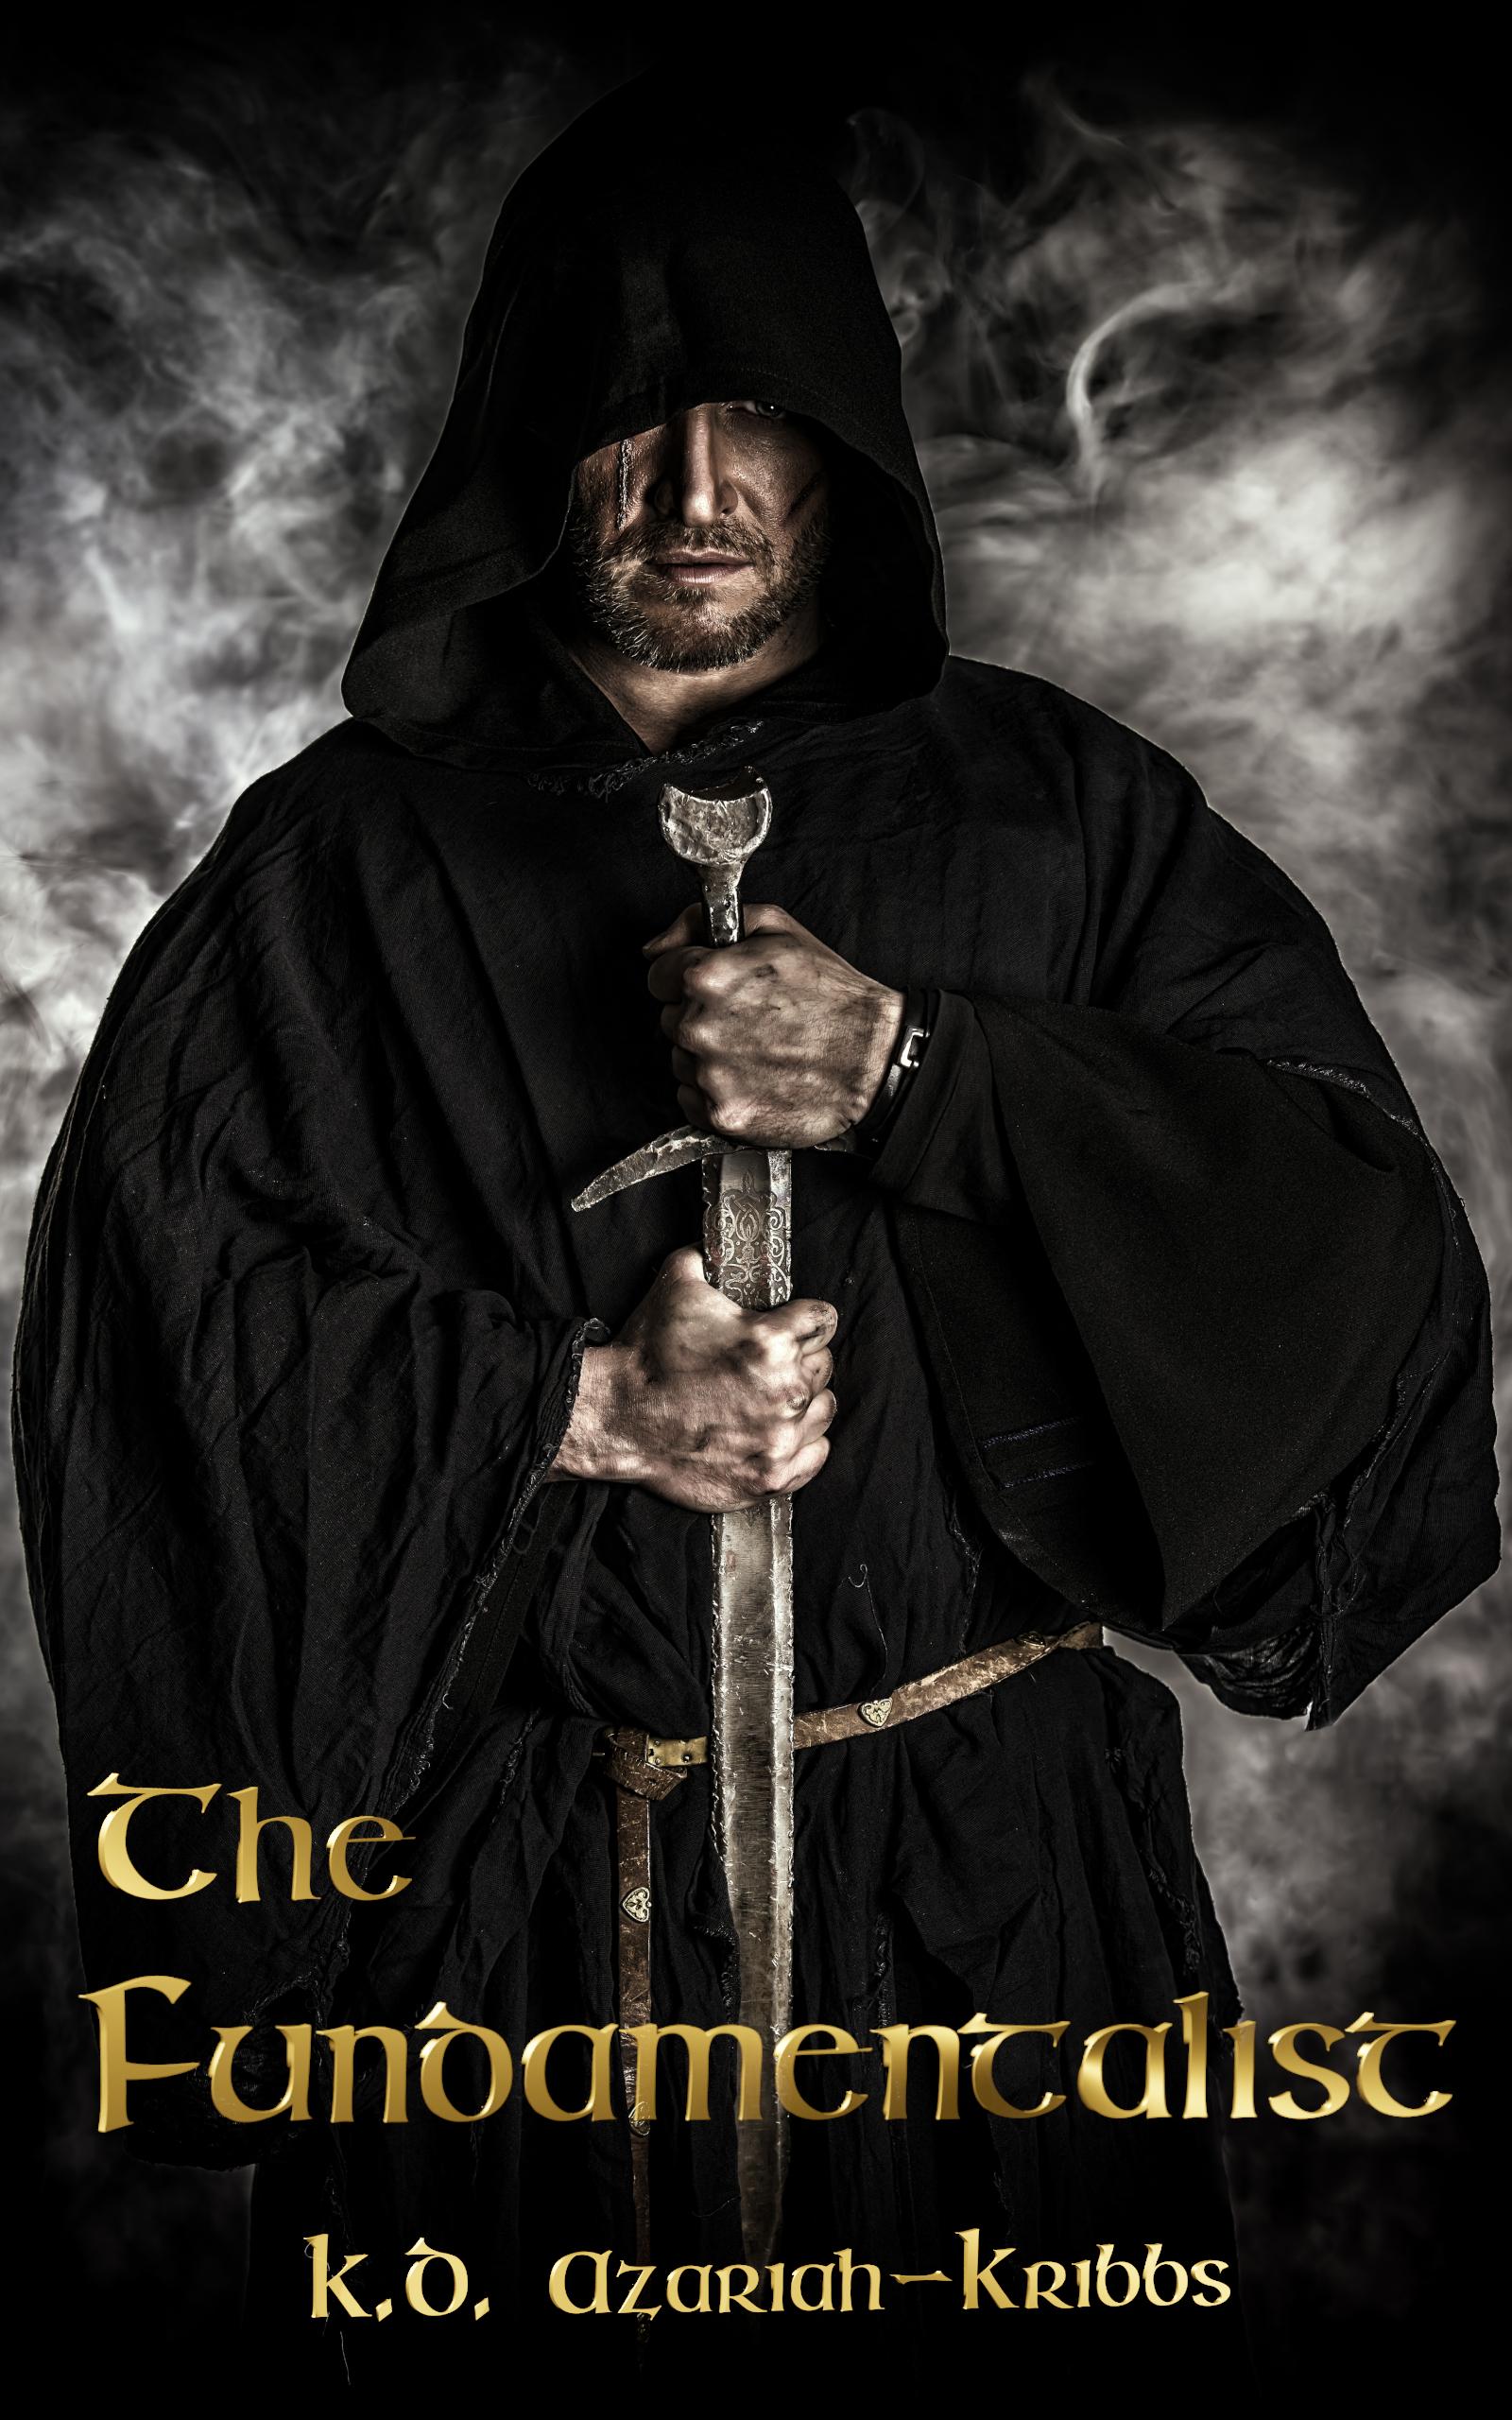 The Fundamentalist cover